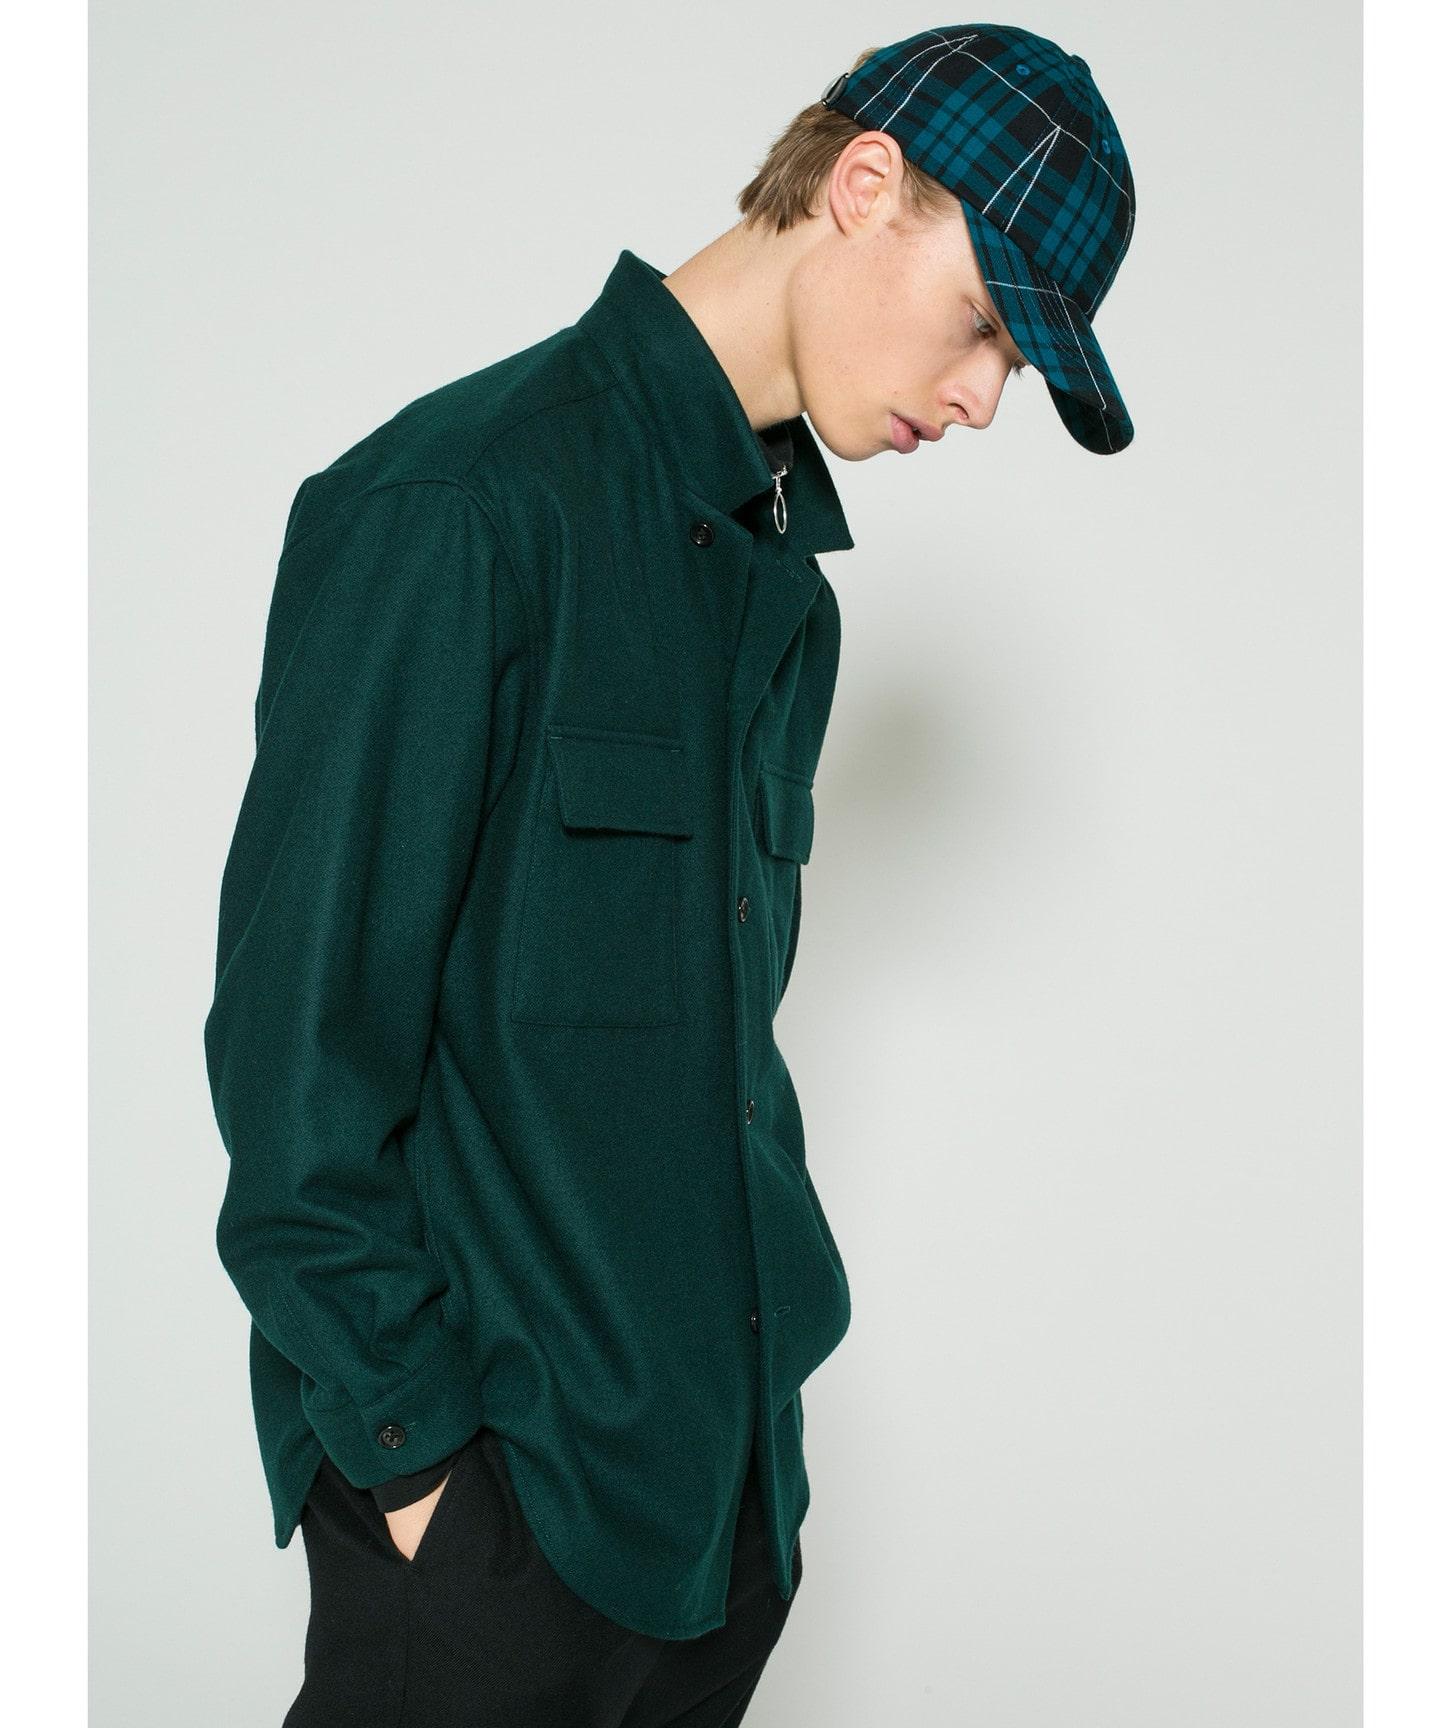 DK.GREEN